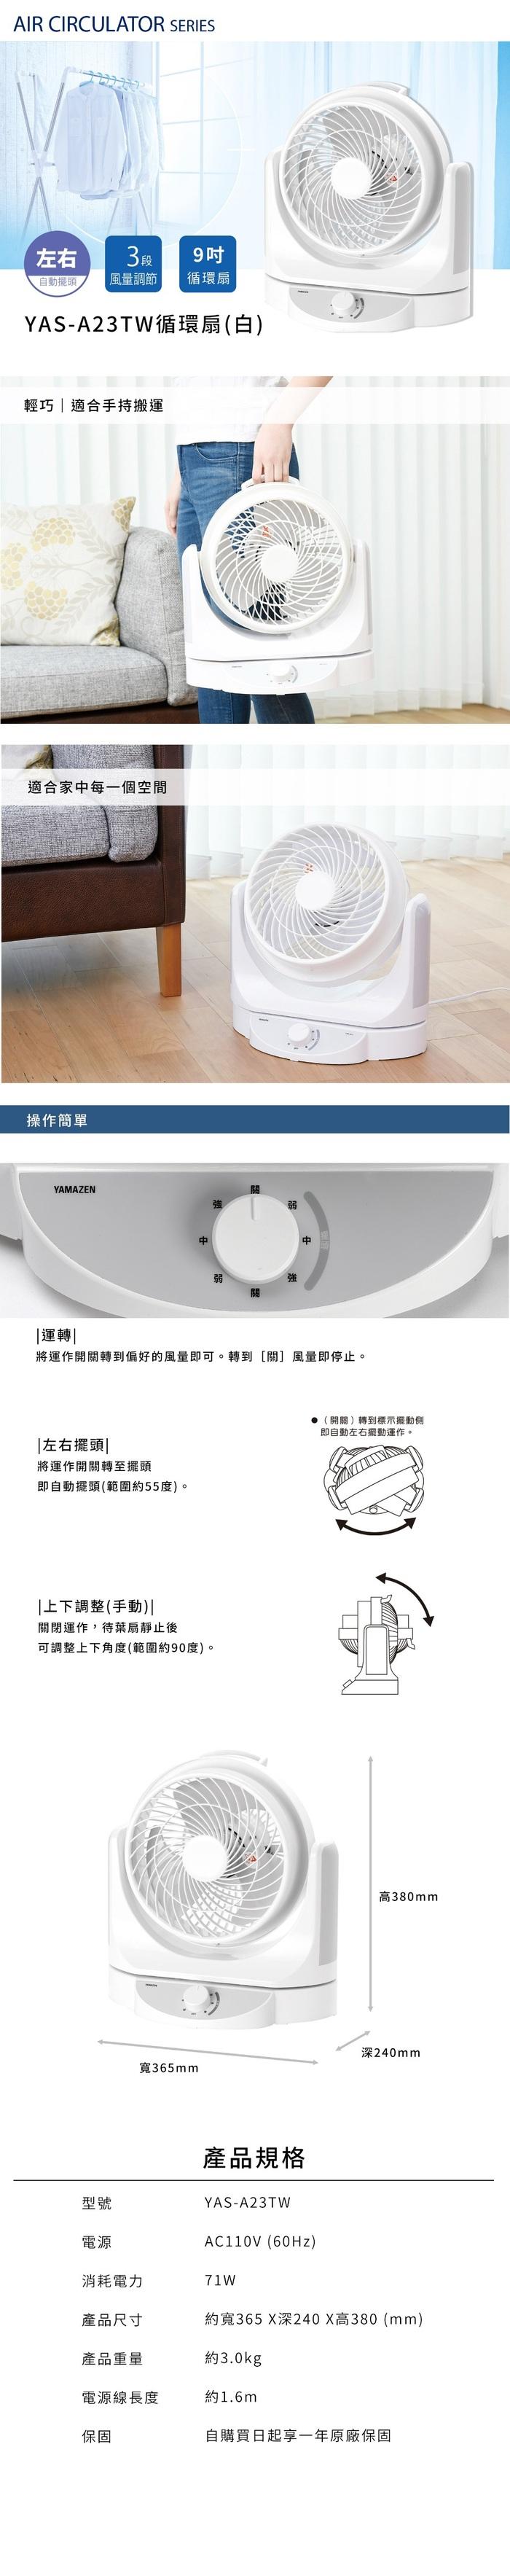 YAMAZEN|YAS-A23TW 9吋循環扇